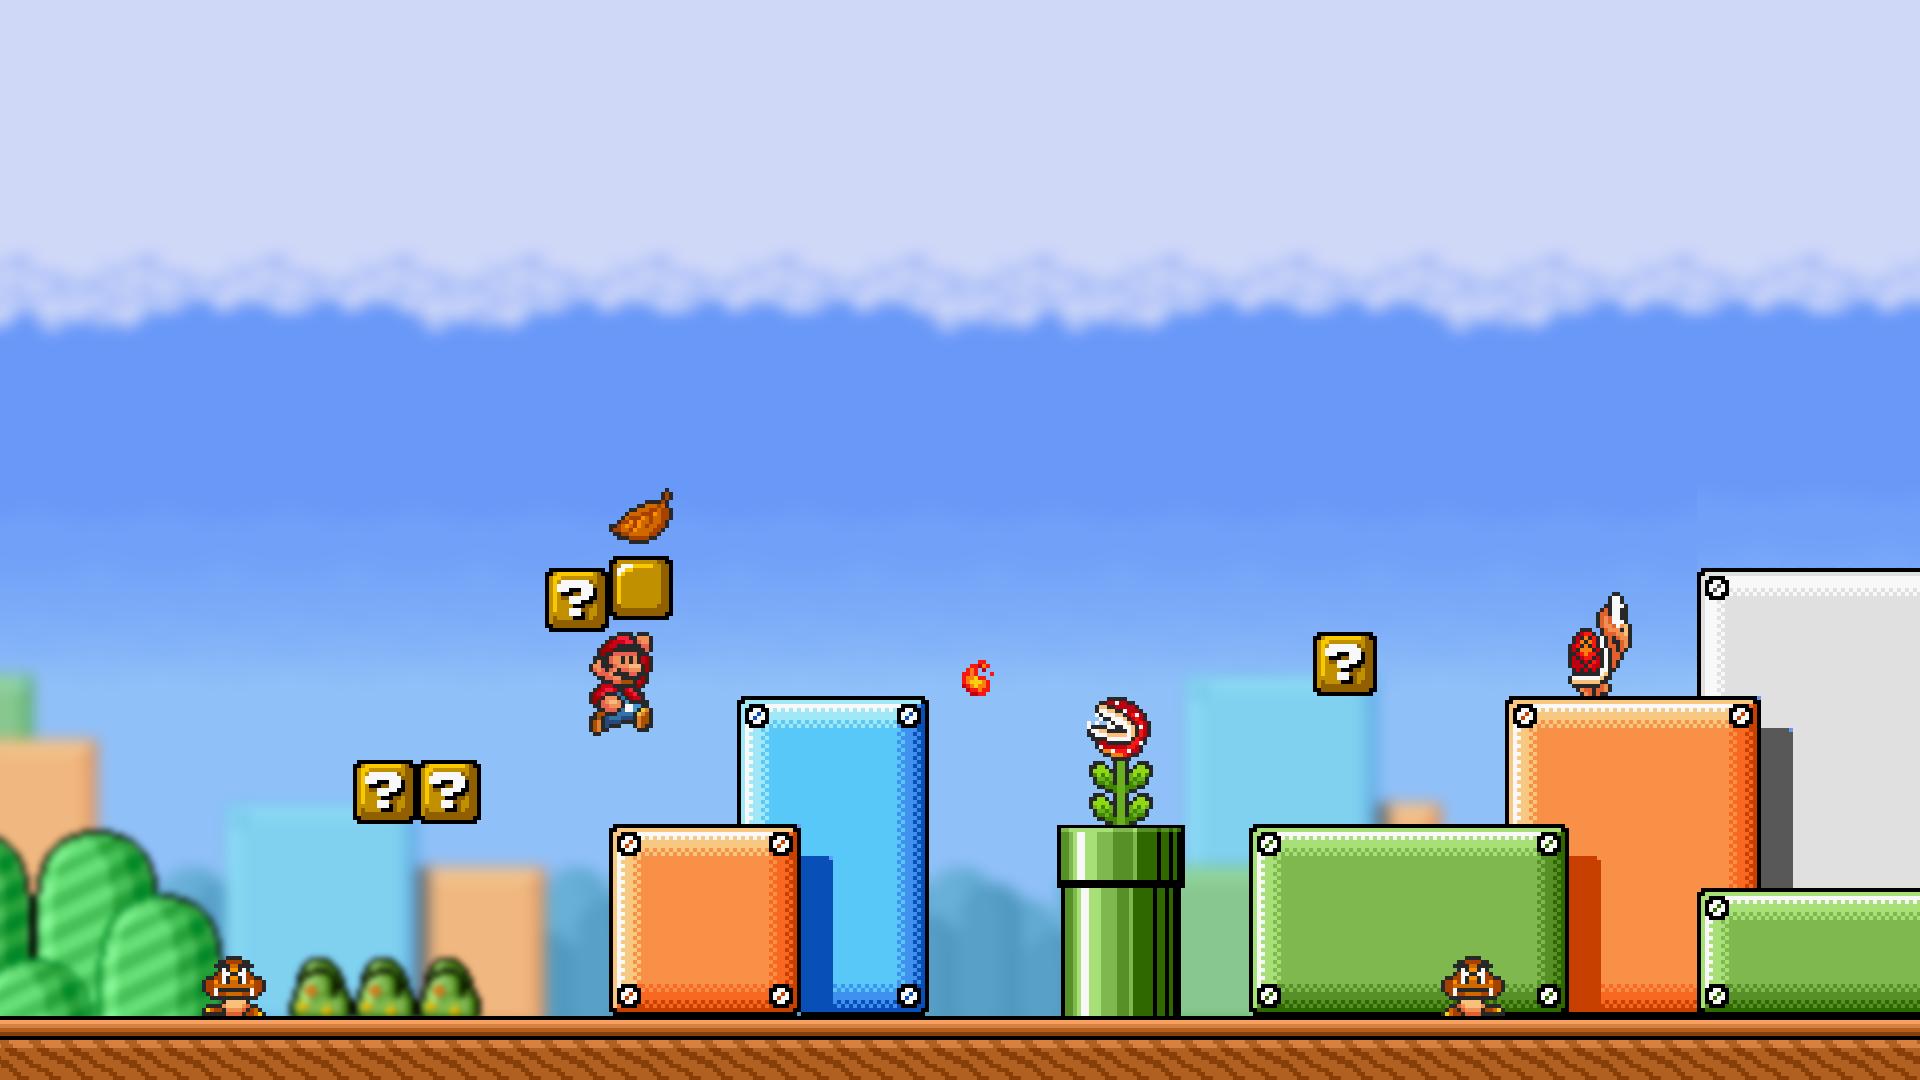 Wallpaper Super Mario Video Games Super Mario Bros 3 1920x1080